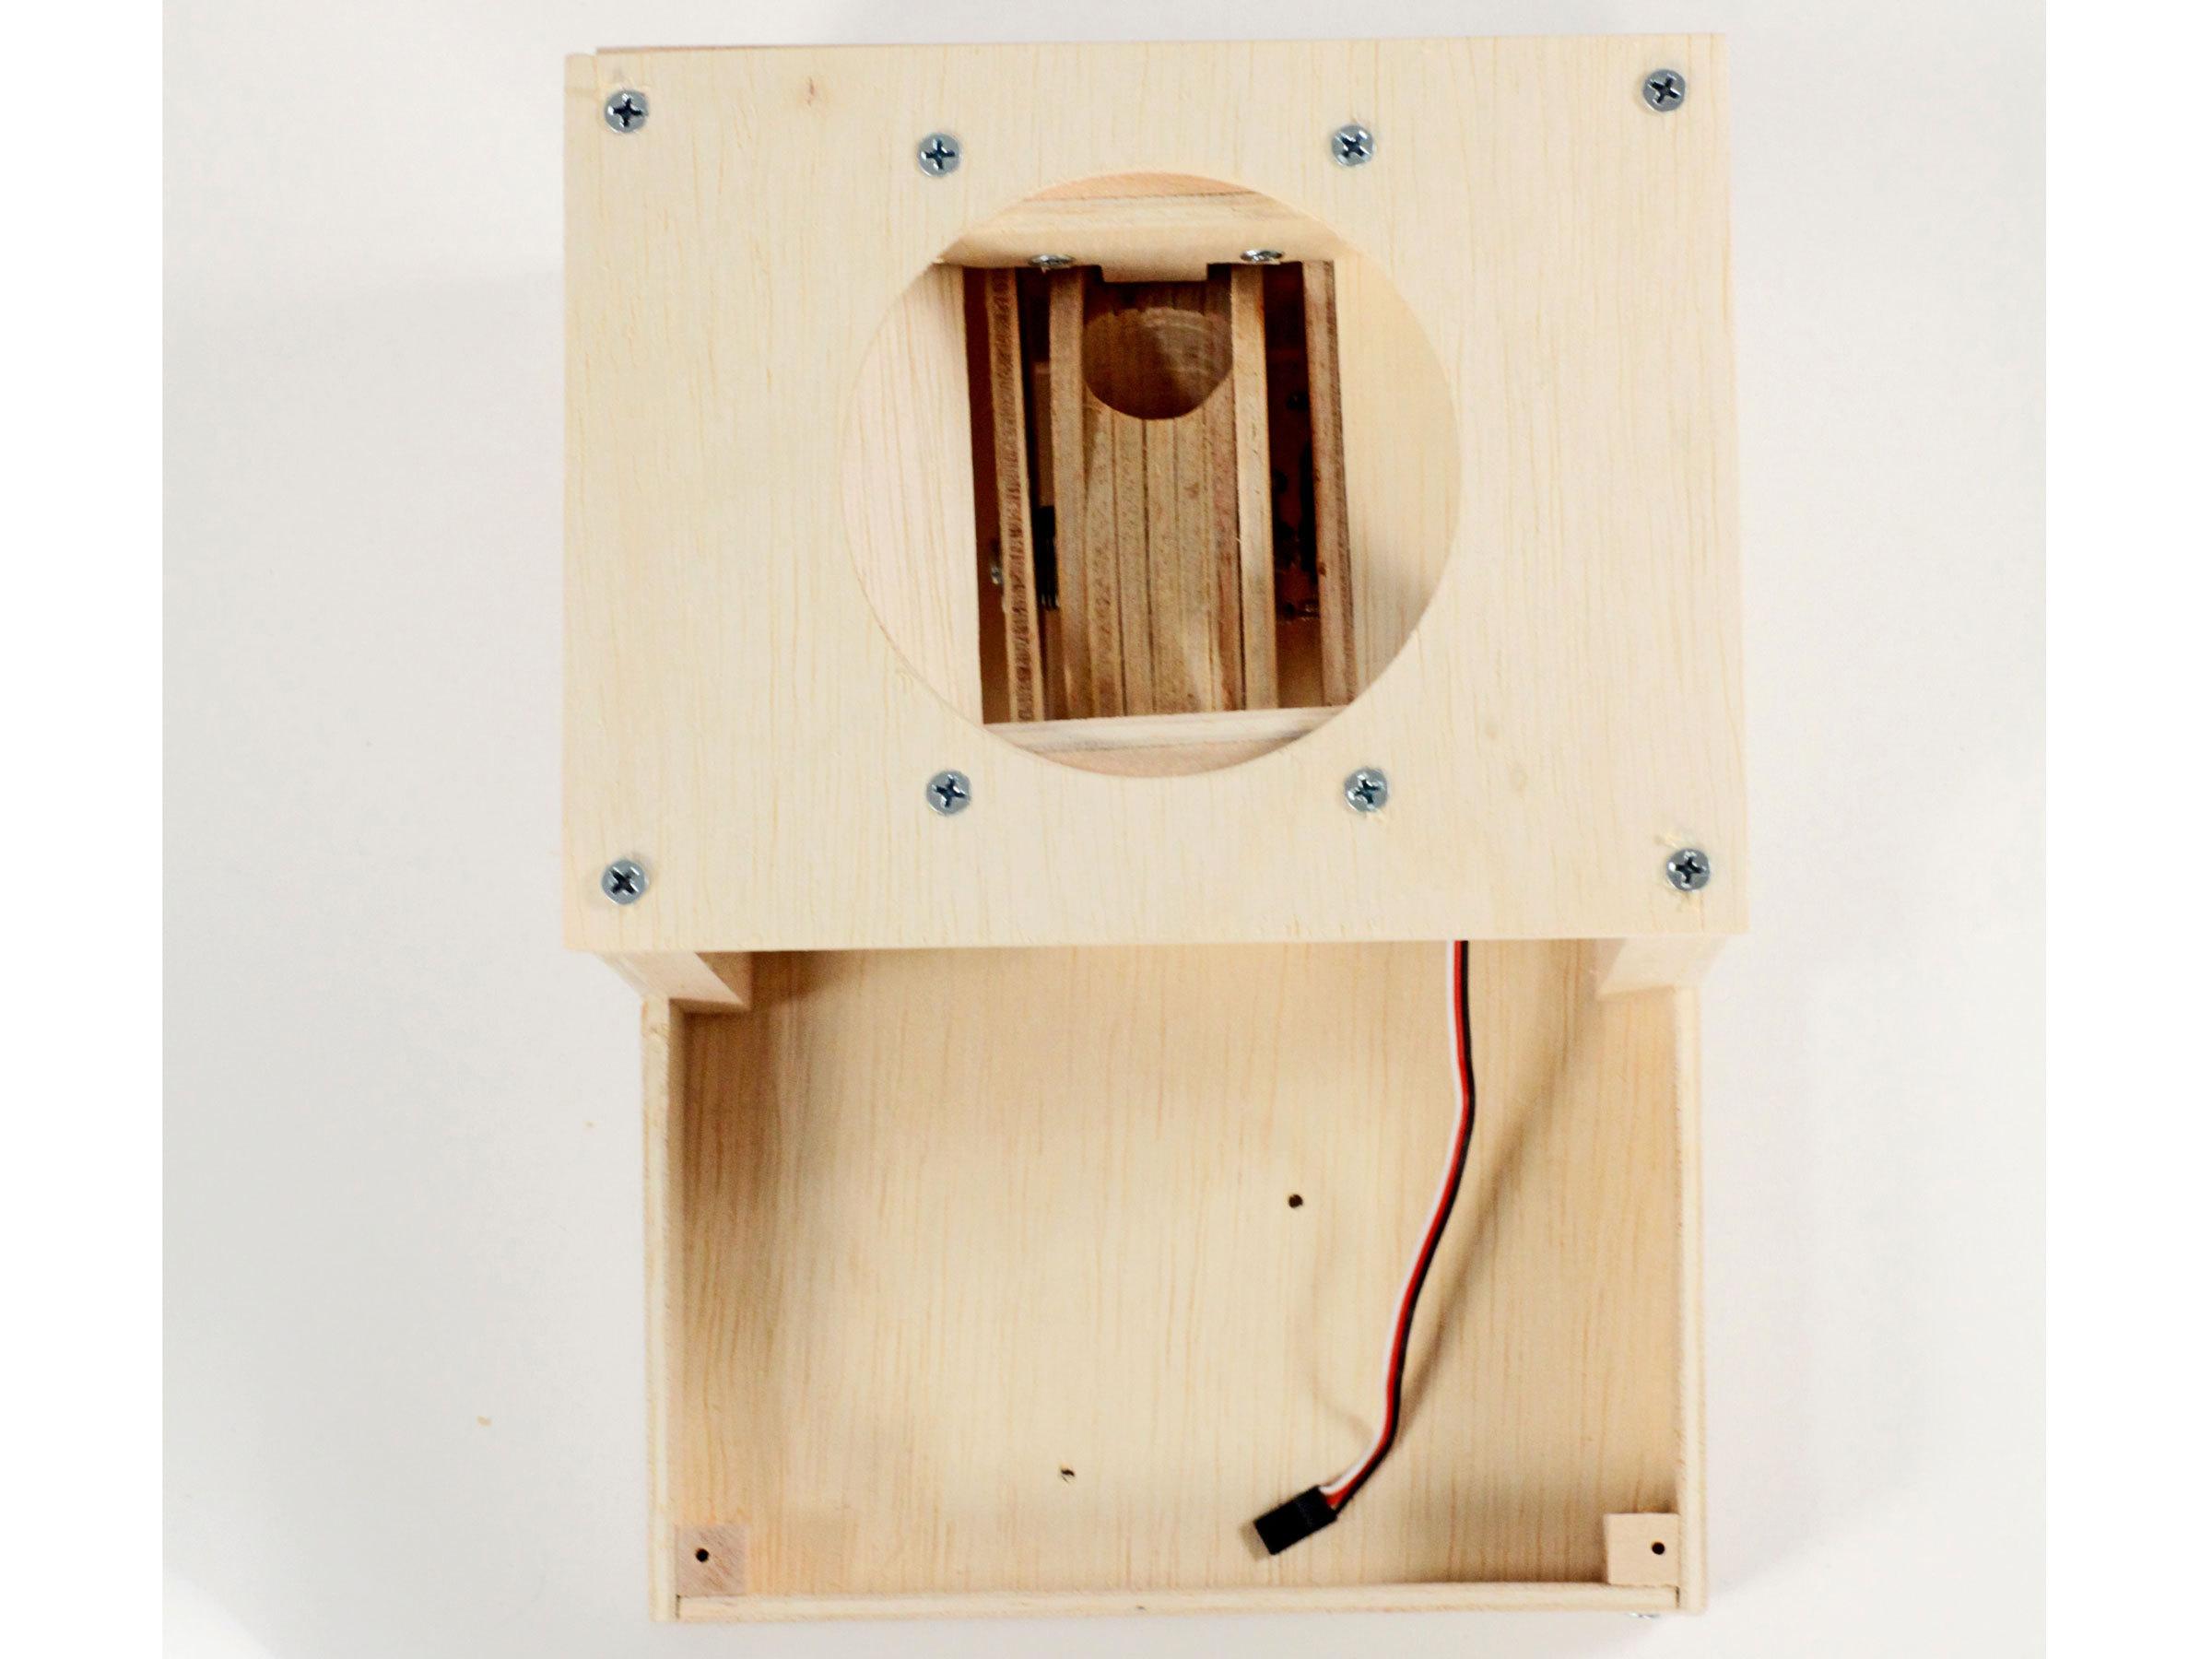 Secret-Knock Gumball Machine